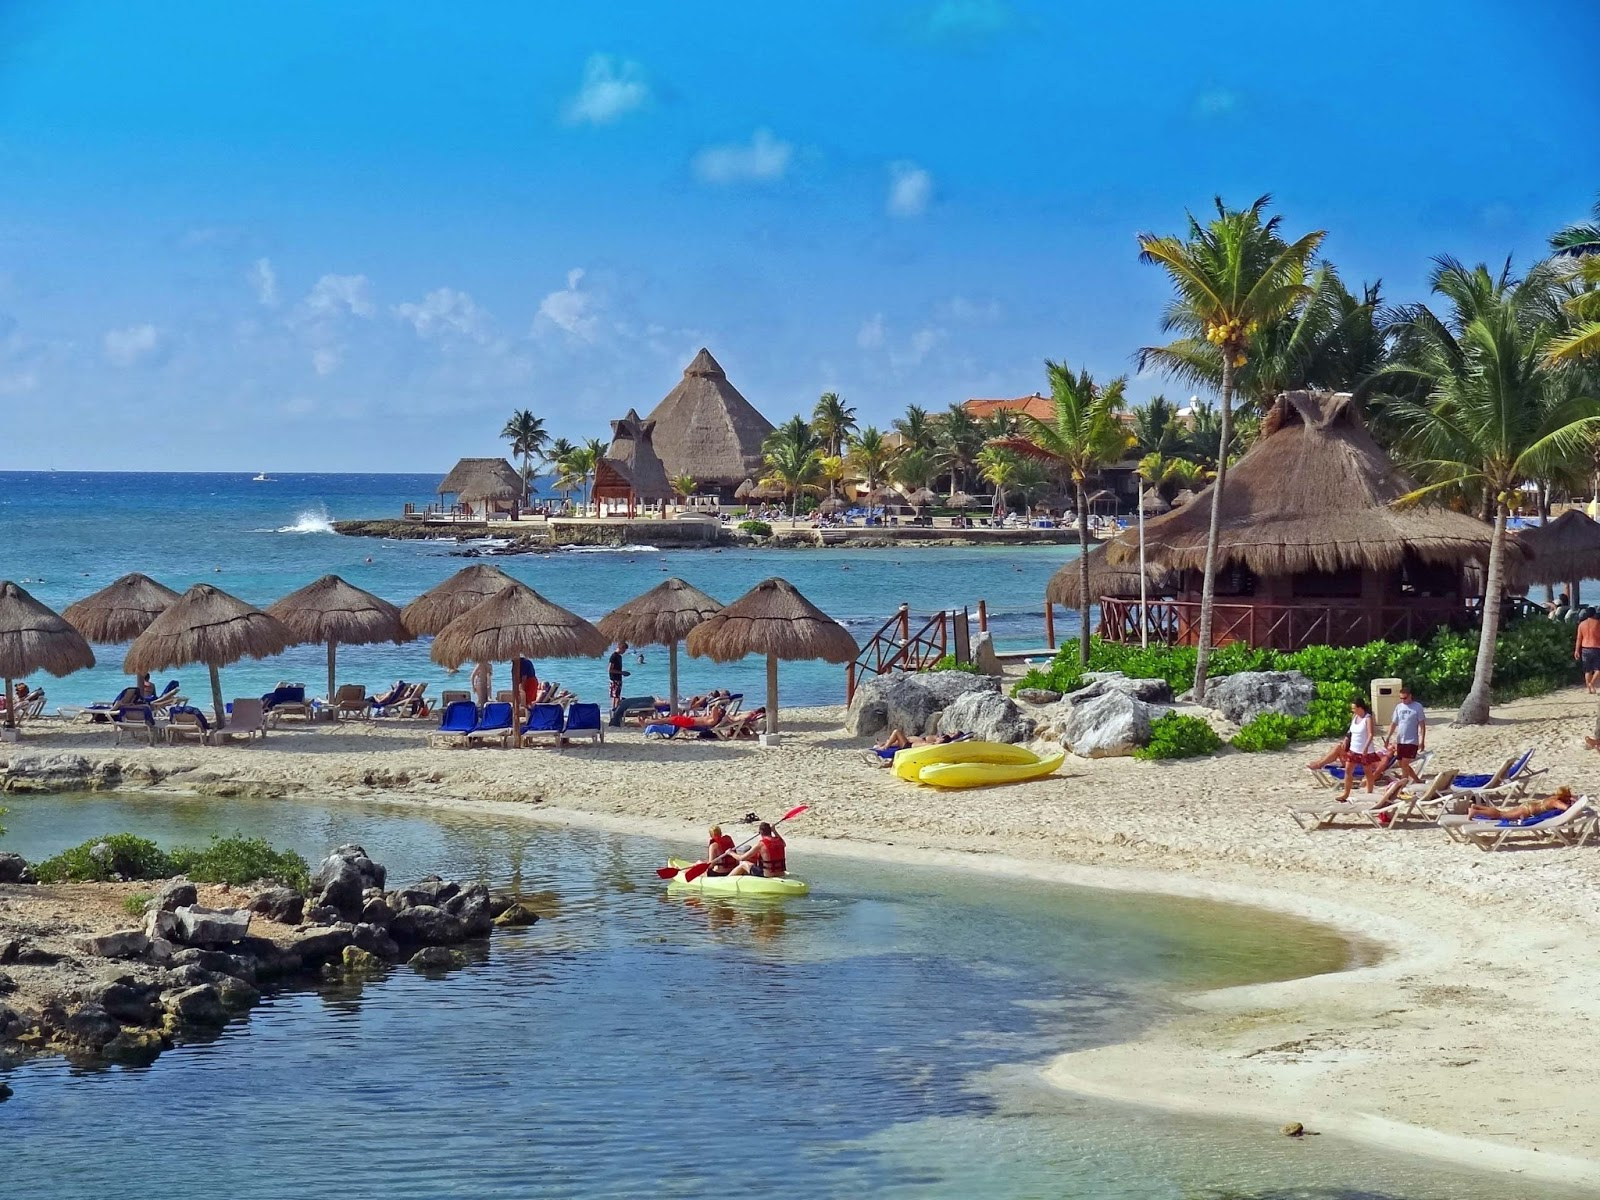 Hotel Dreams Riviera Cancun Resort